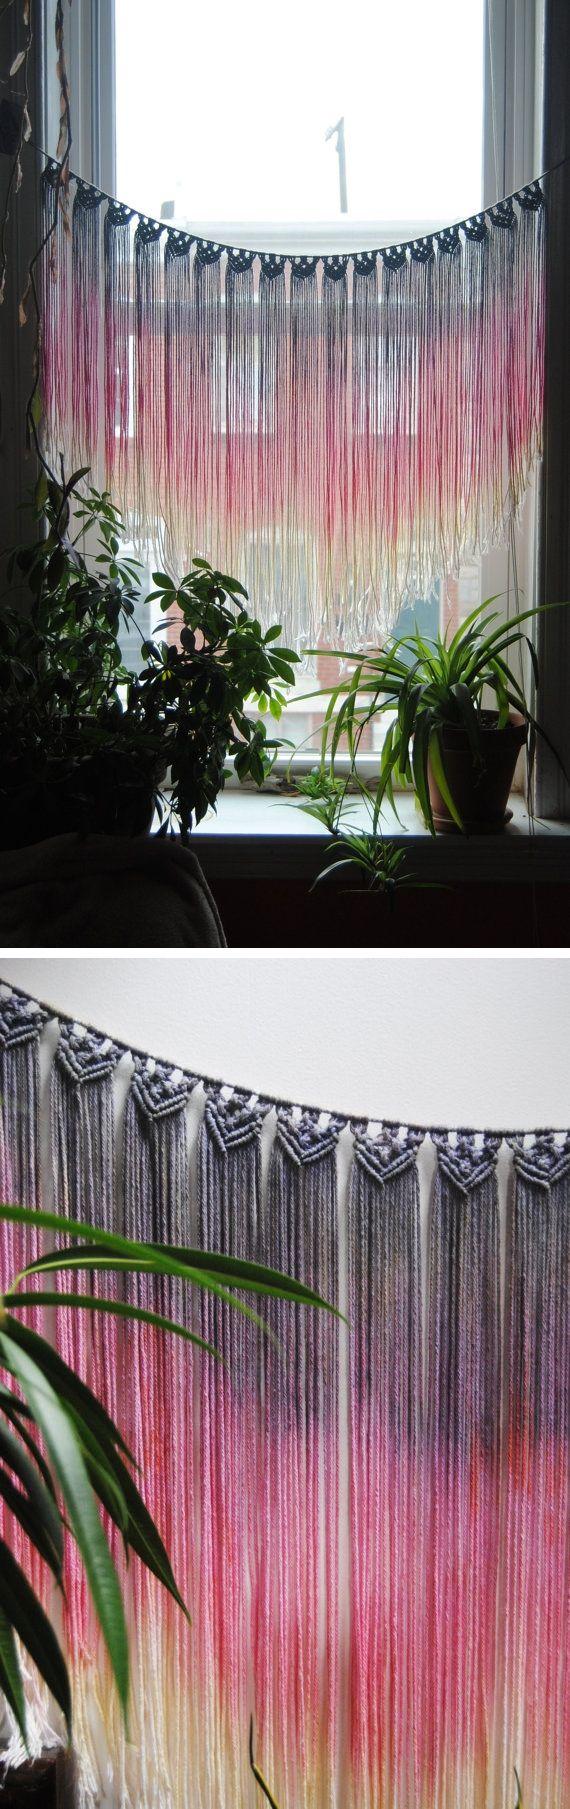 macrame wall hanging diy pinterest basteln h keln und handarbeit. Black Bedroom Furniture Sets. Home Design Ideas